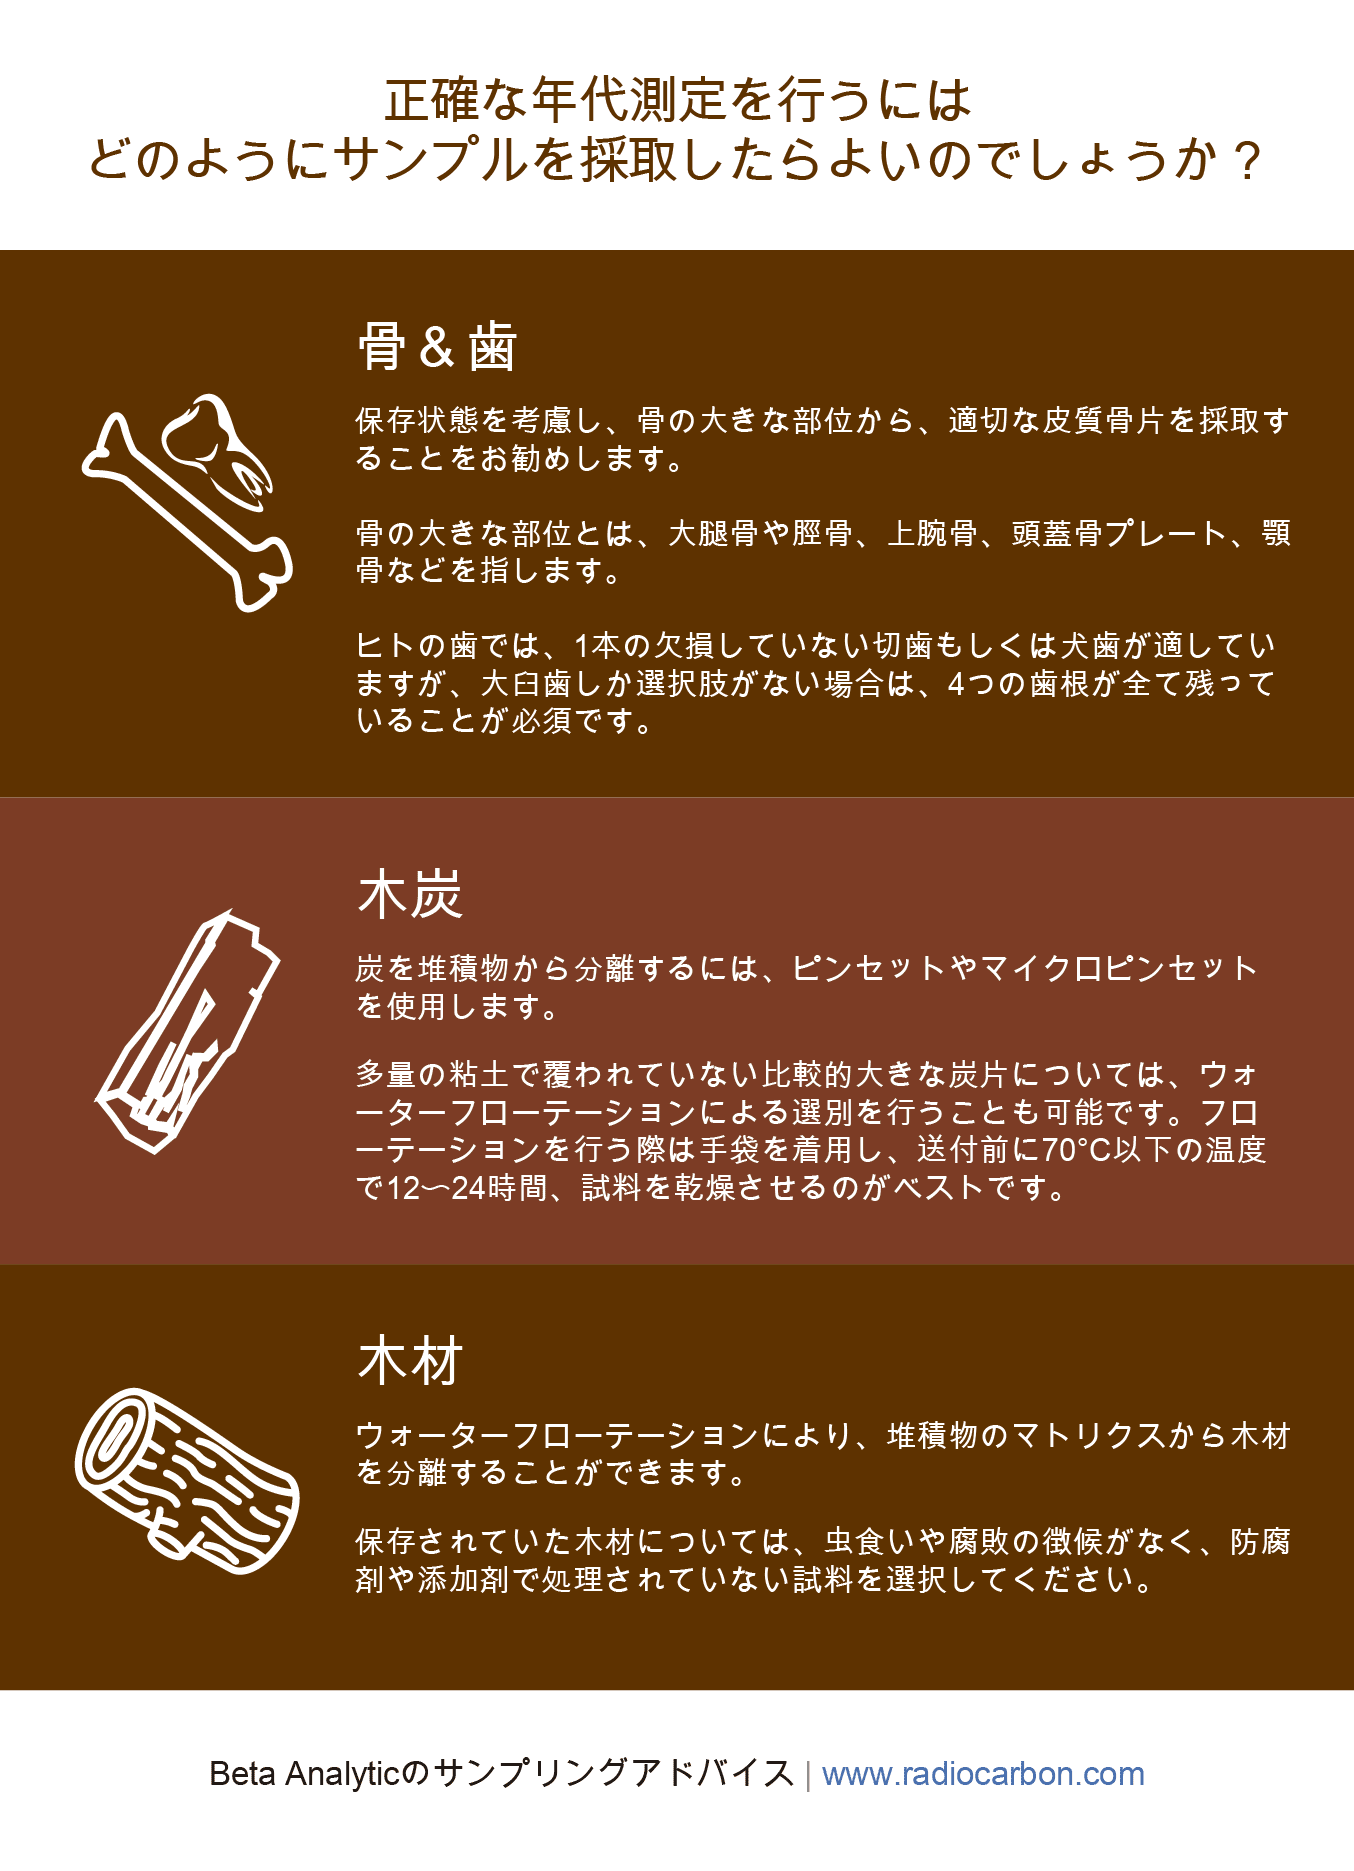 Beta Analytic Sampling Advice Japanese